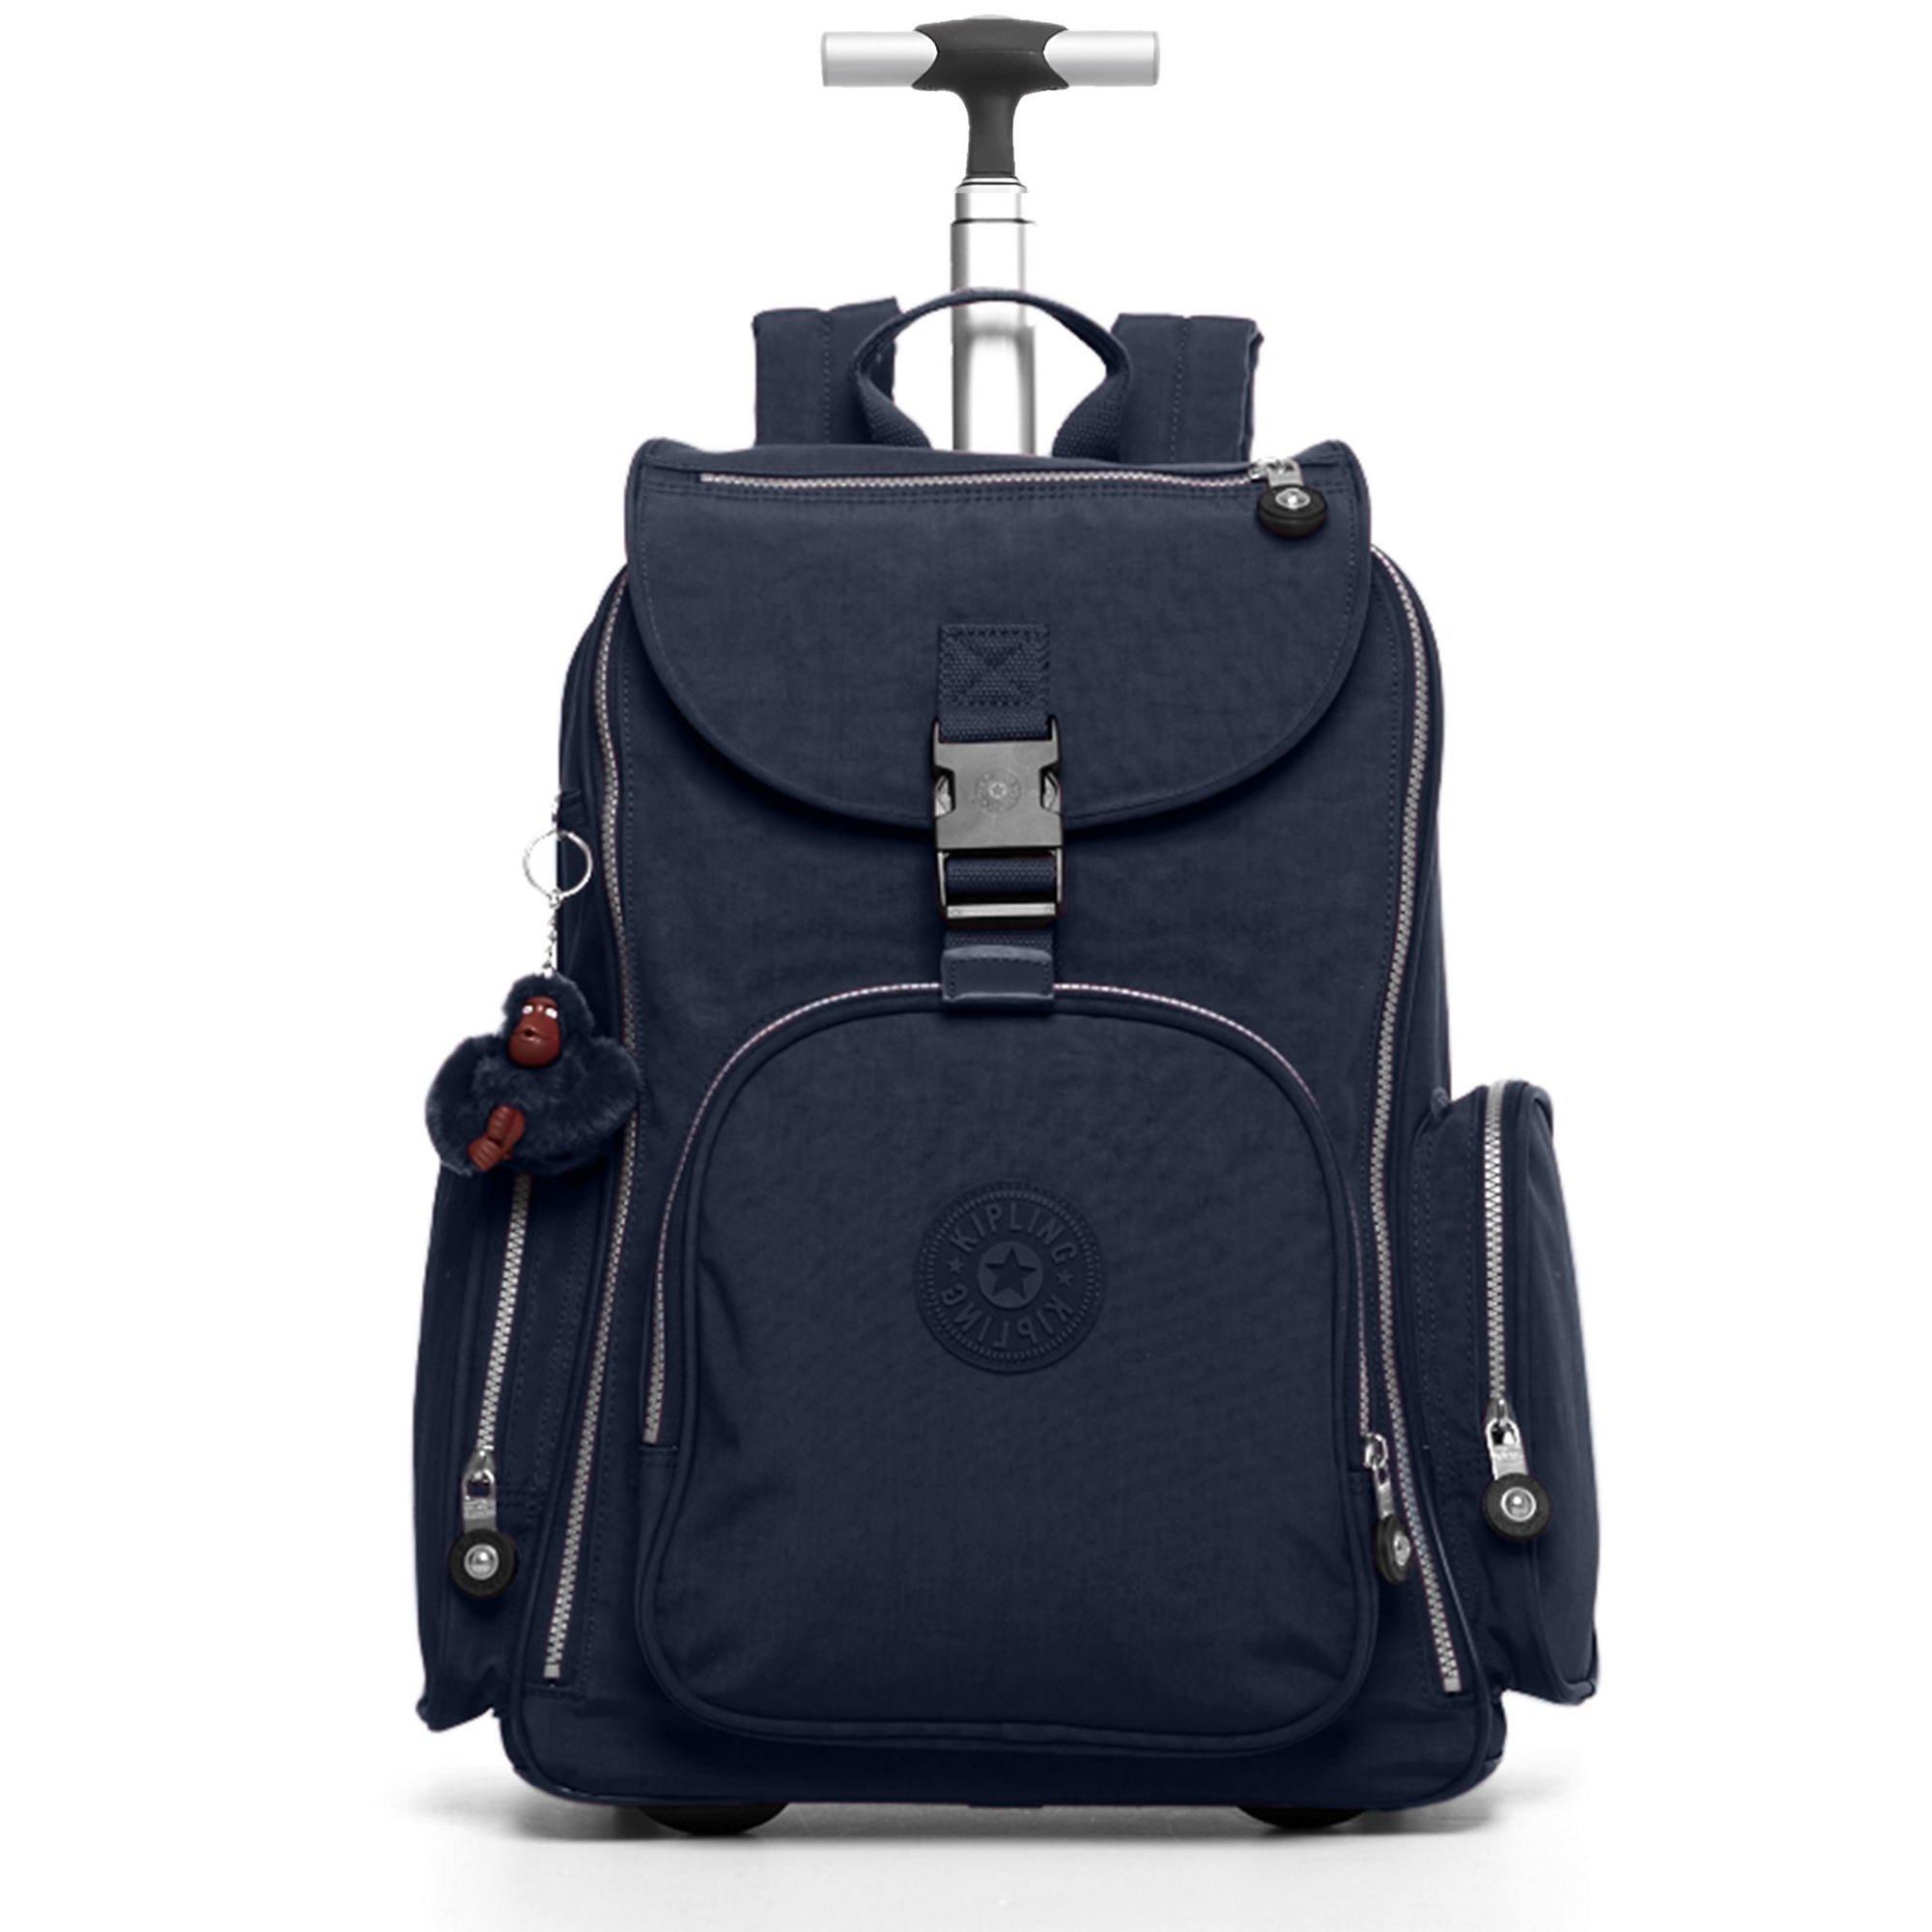 Kipling Luggage Alcatraz Backpack Protection